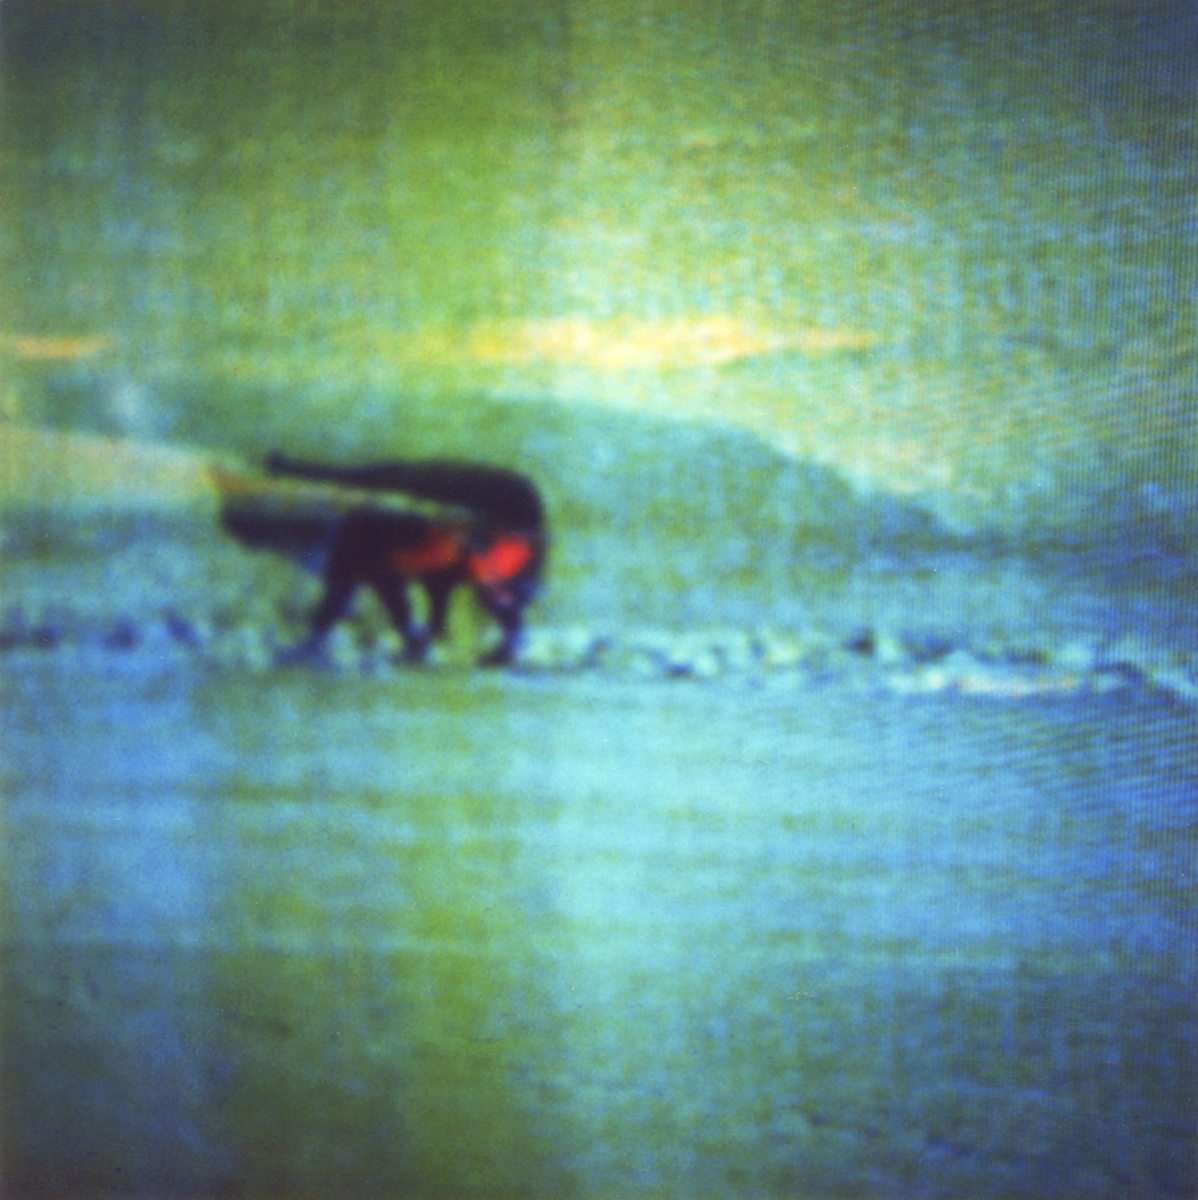 Television-TV-Polaroid-SX70-Surreal-Wolf.jpg